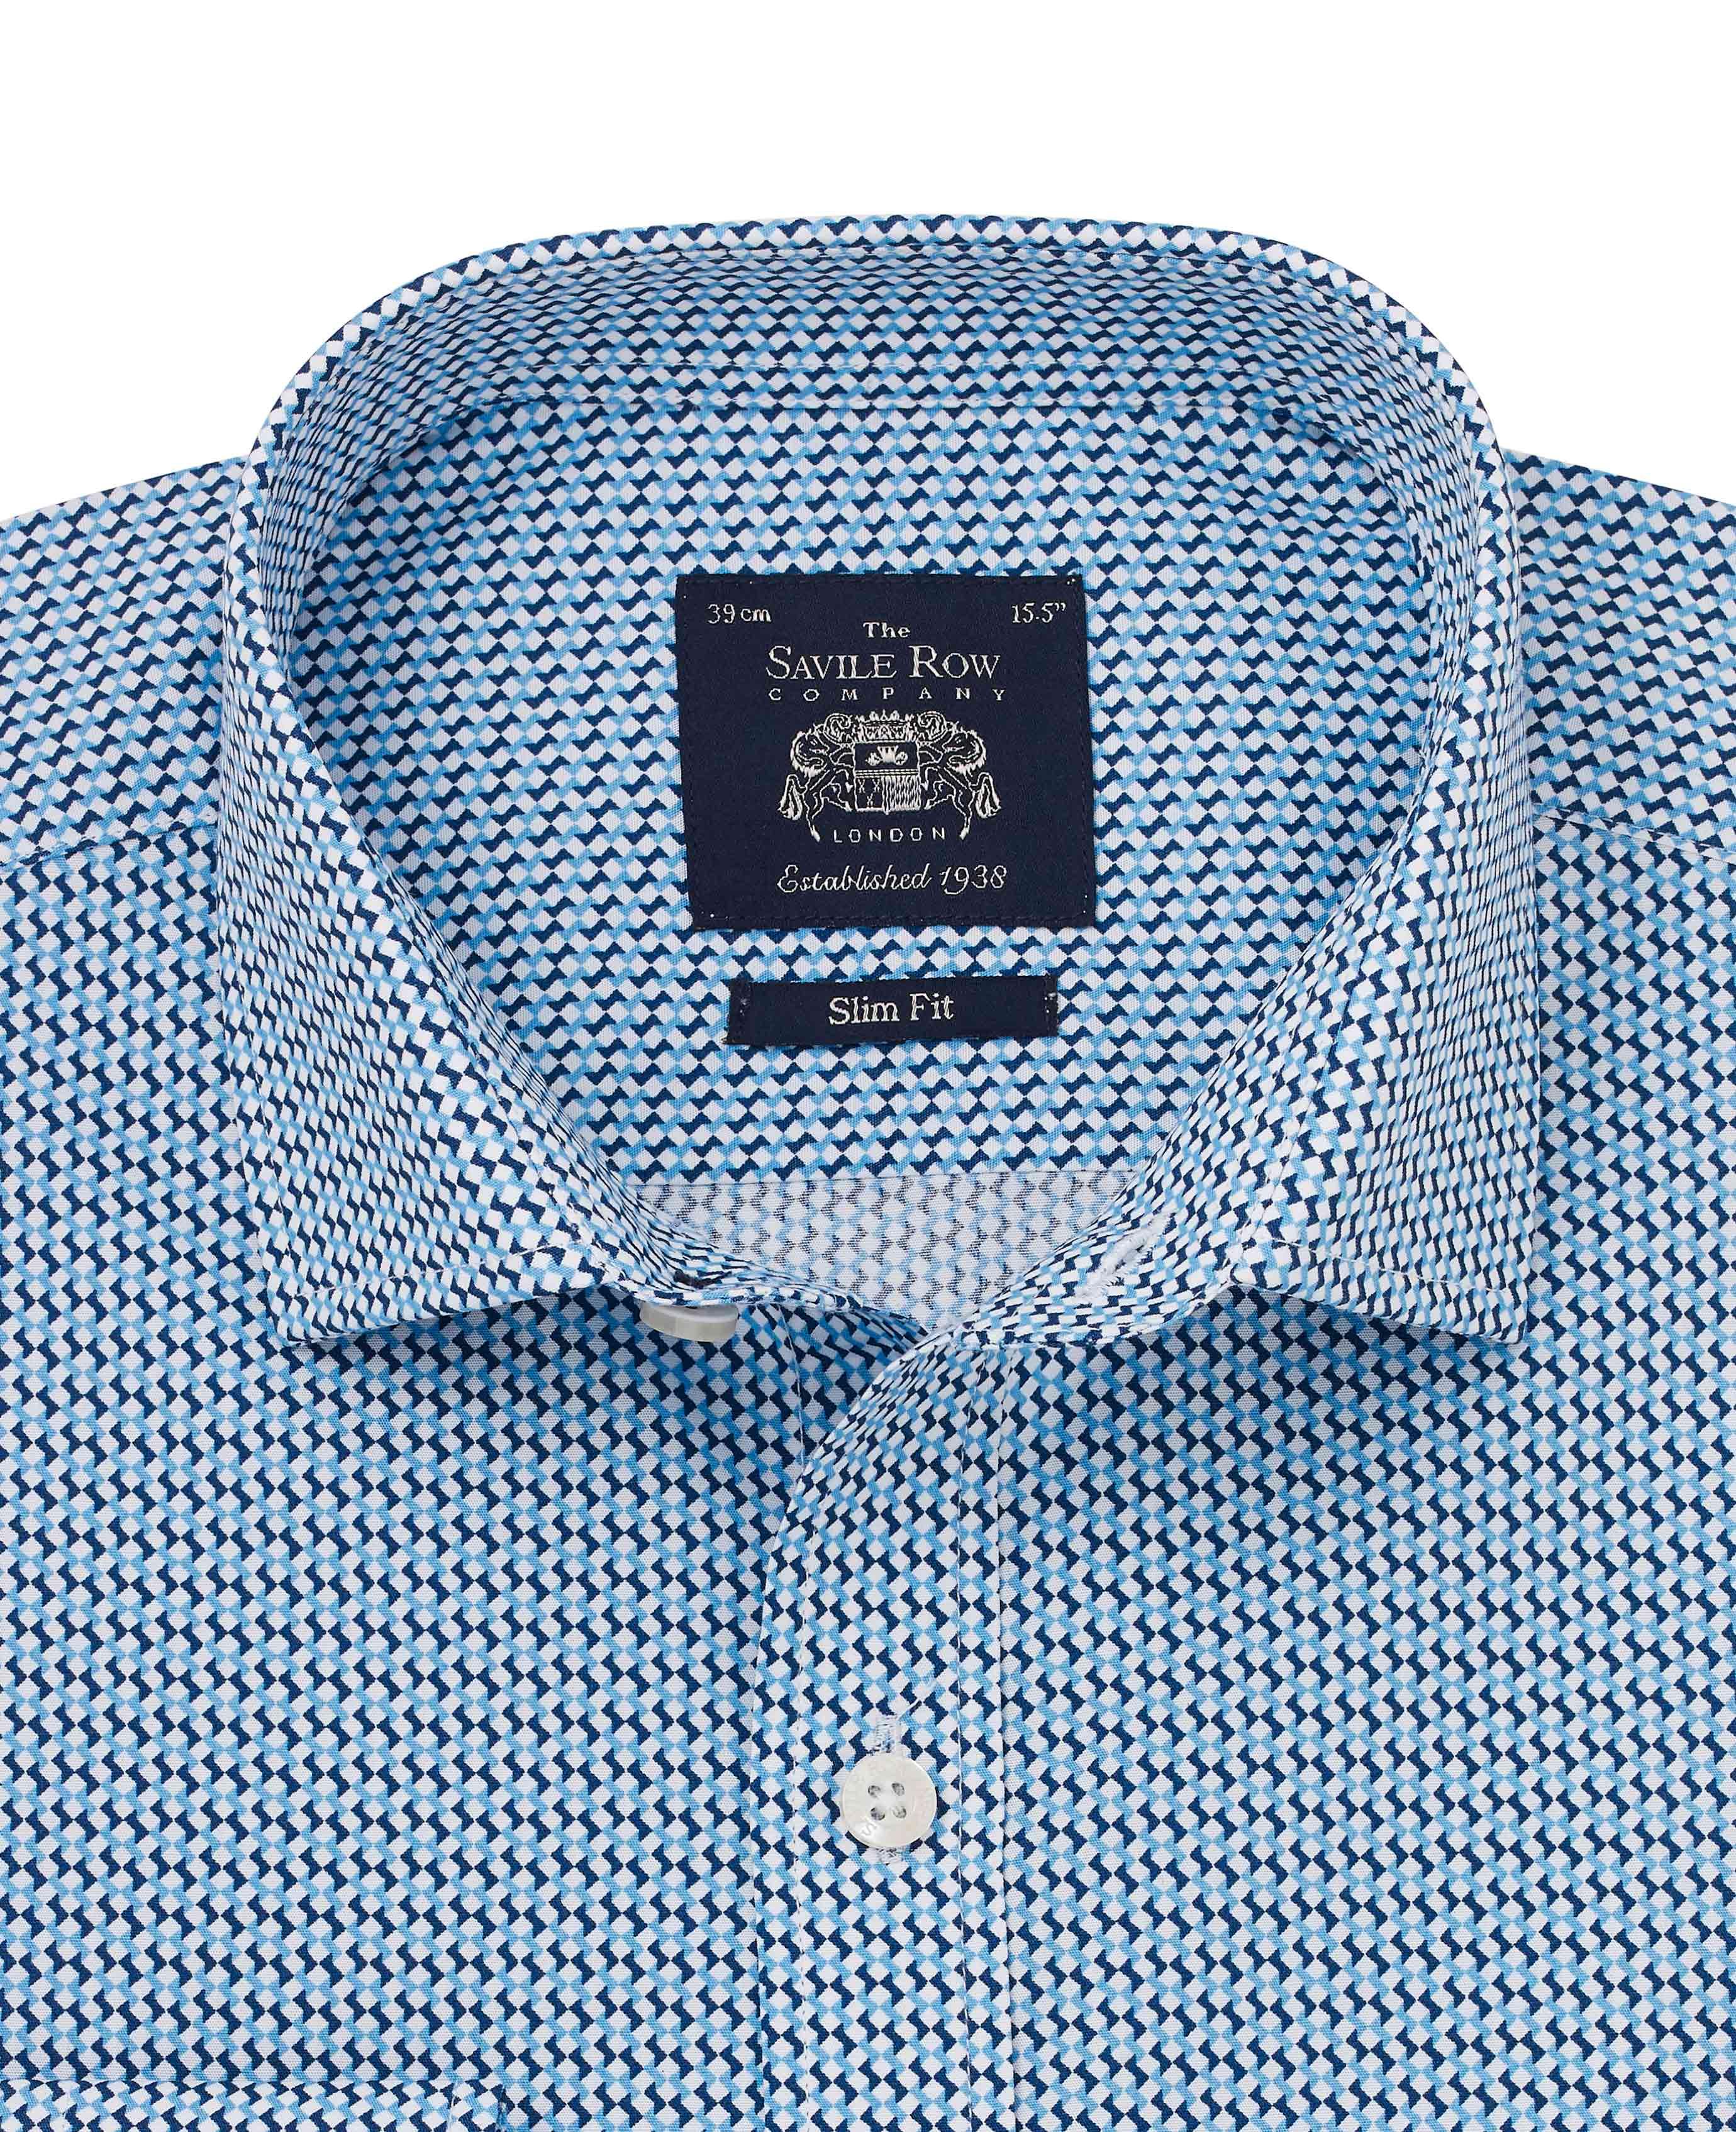 Savile-Row-Men-039-s-White-Blue-Geo-Print-Slim-Fit-Shirt-Single-Cuff thumbnail 3